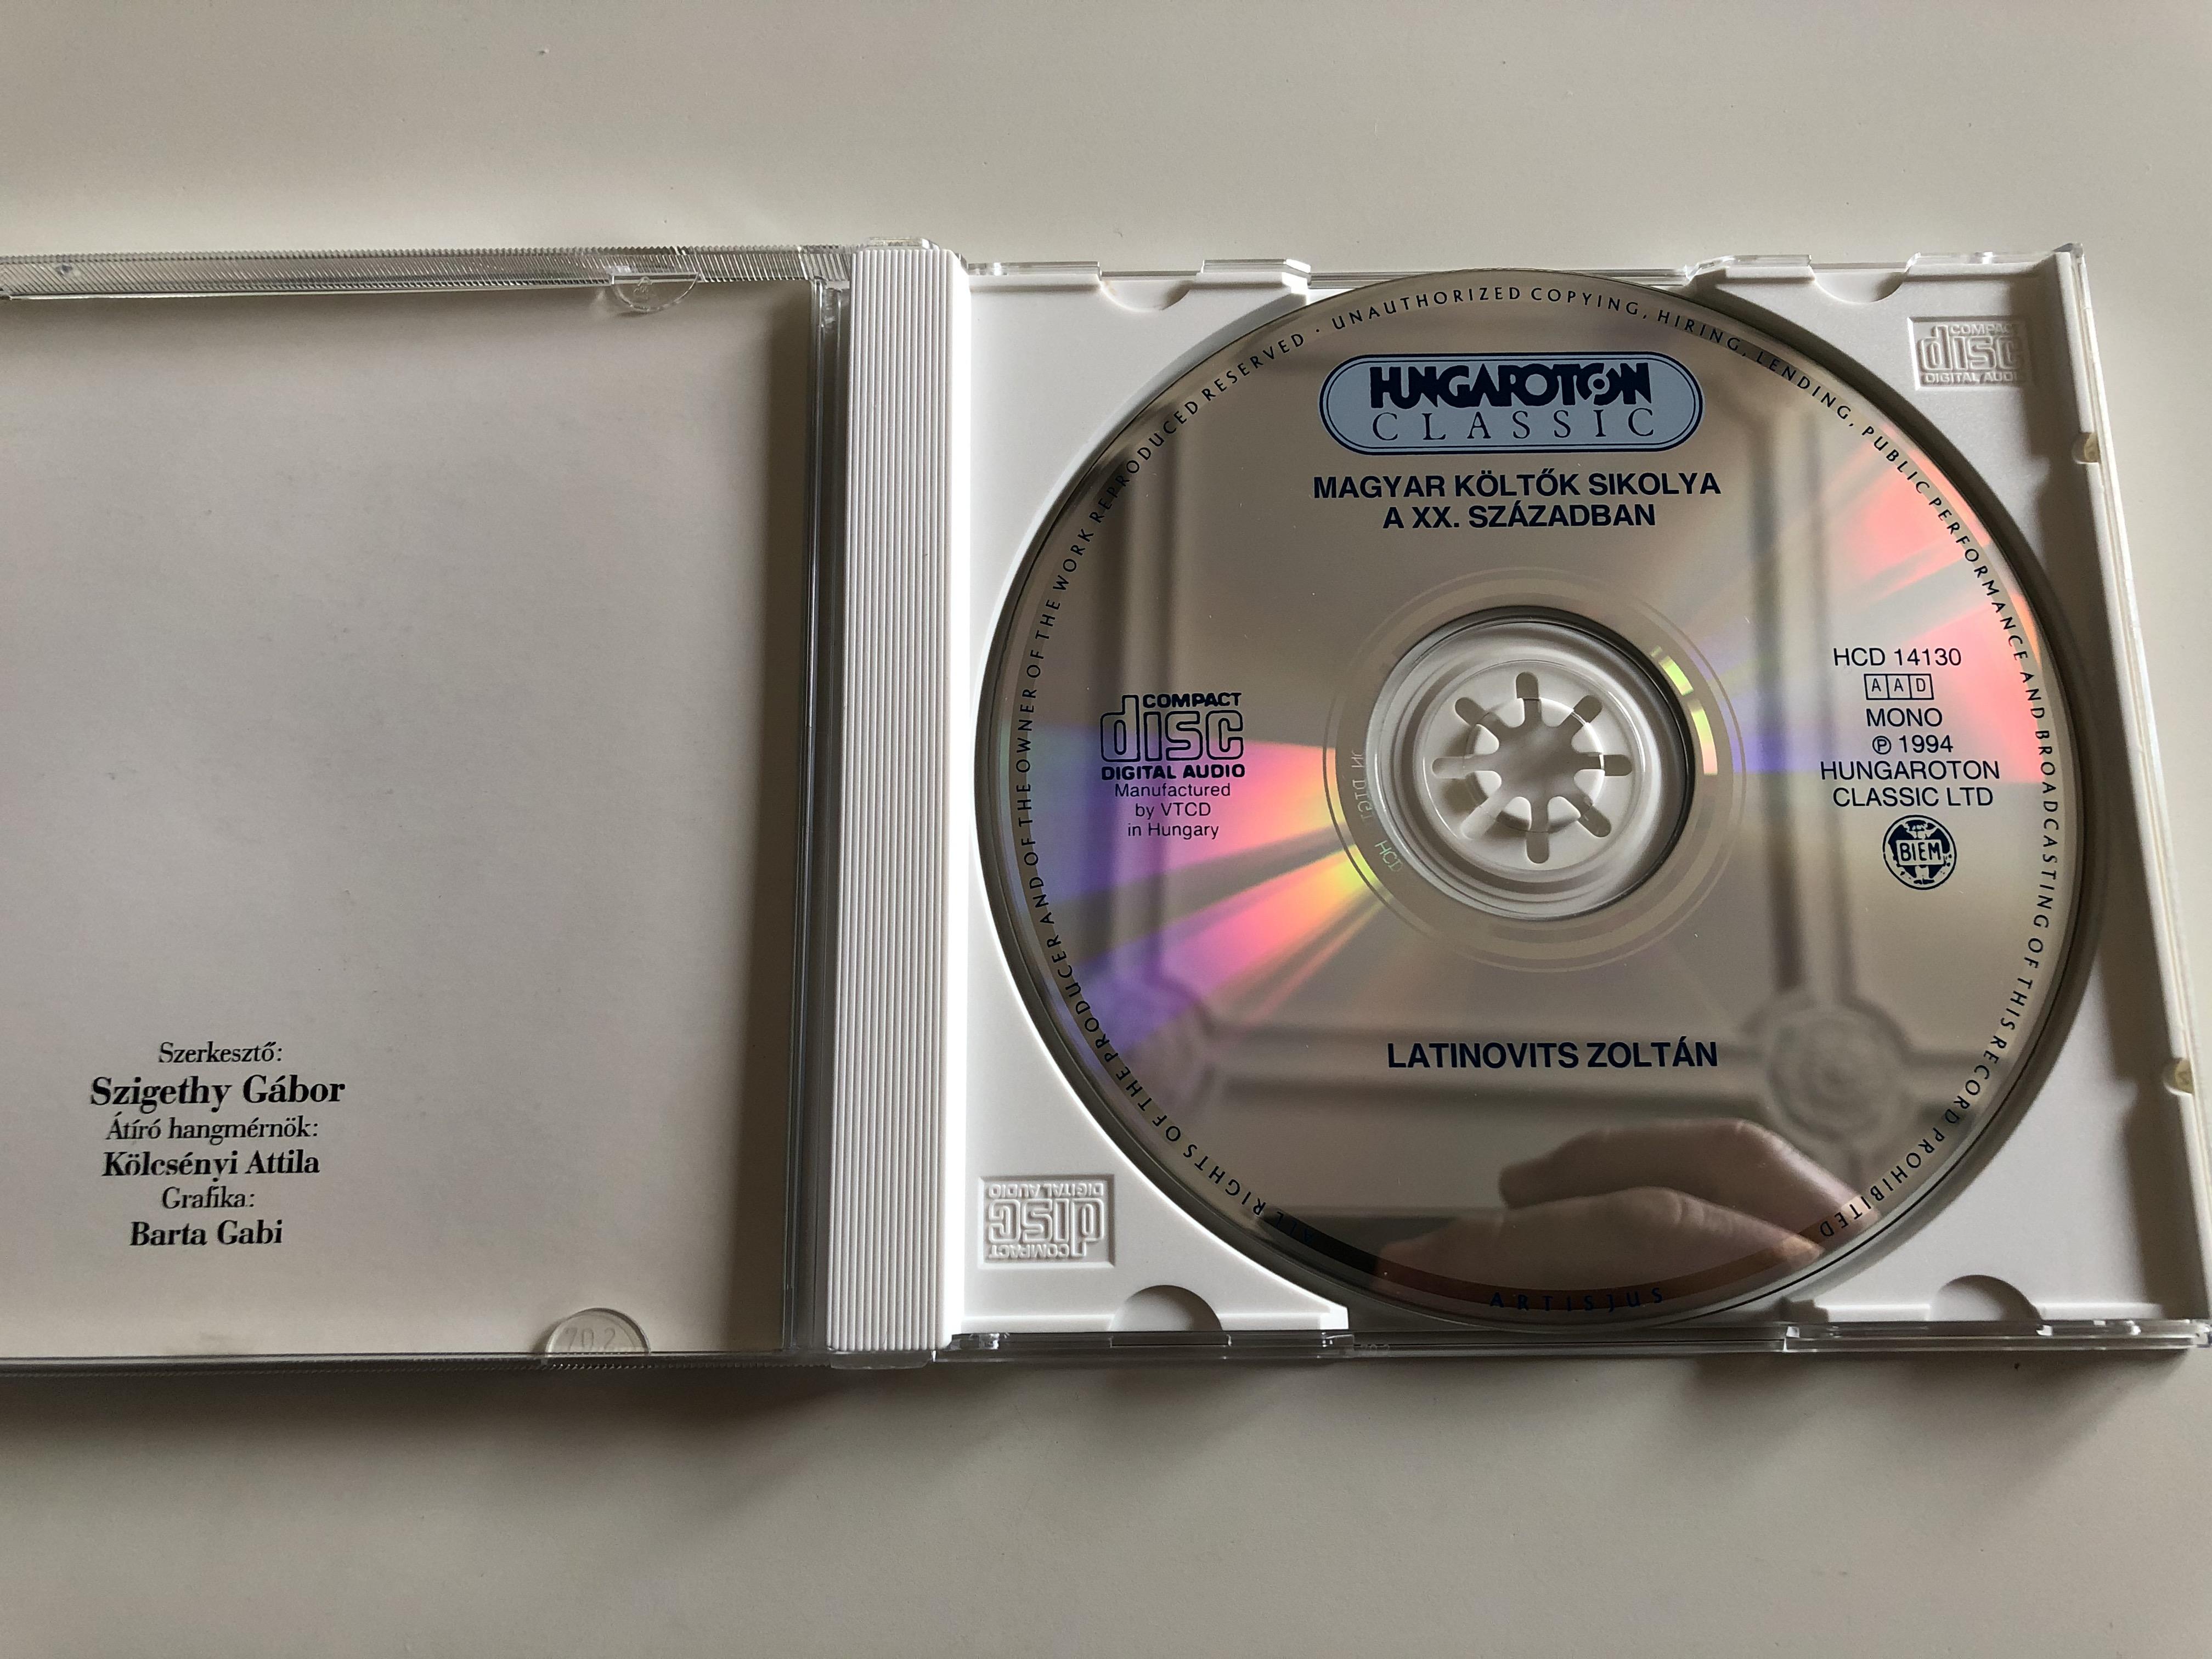 latinovits-zolt-n-magyar-k-lt-k-sikolya-a-xx.-sz-zadban-hungaroton-classic-audio-cd-1994-mono-hcd-14130-4-.jpg